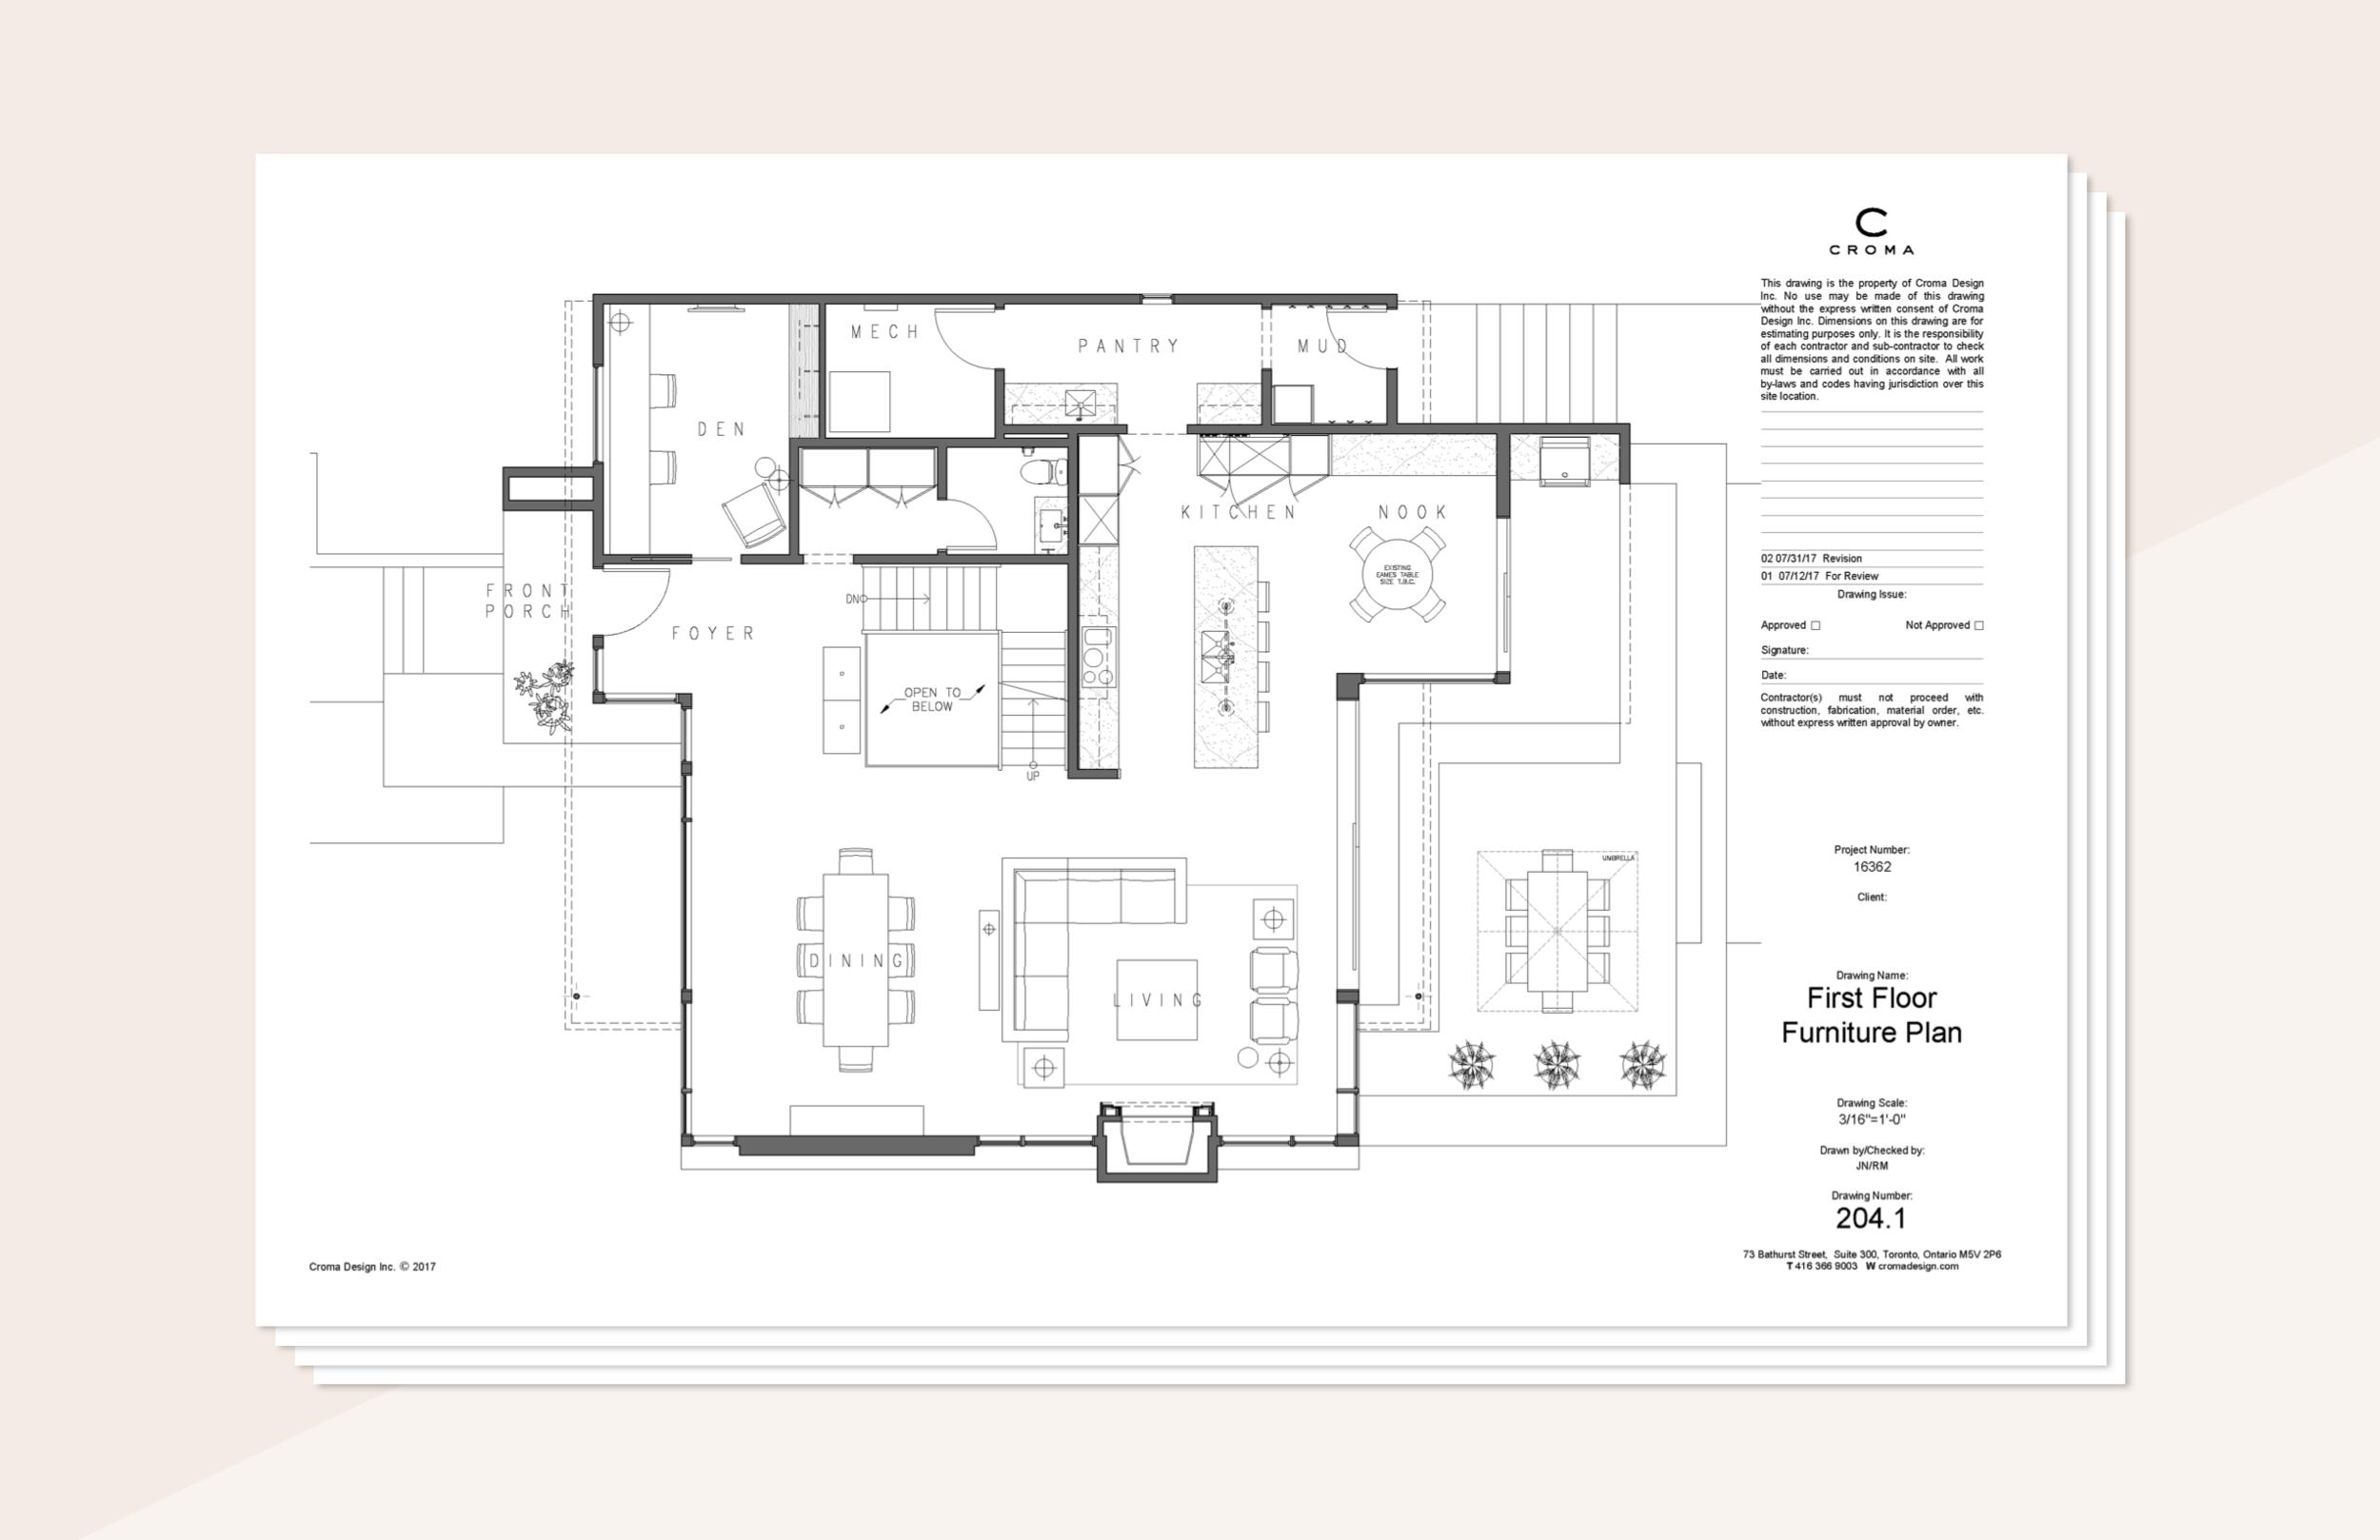 7. Design Development